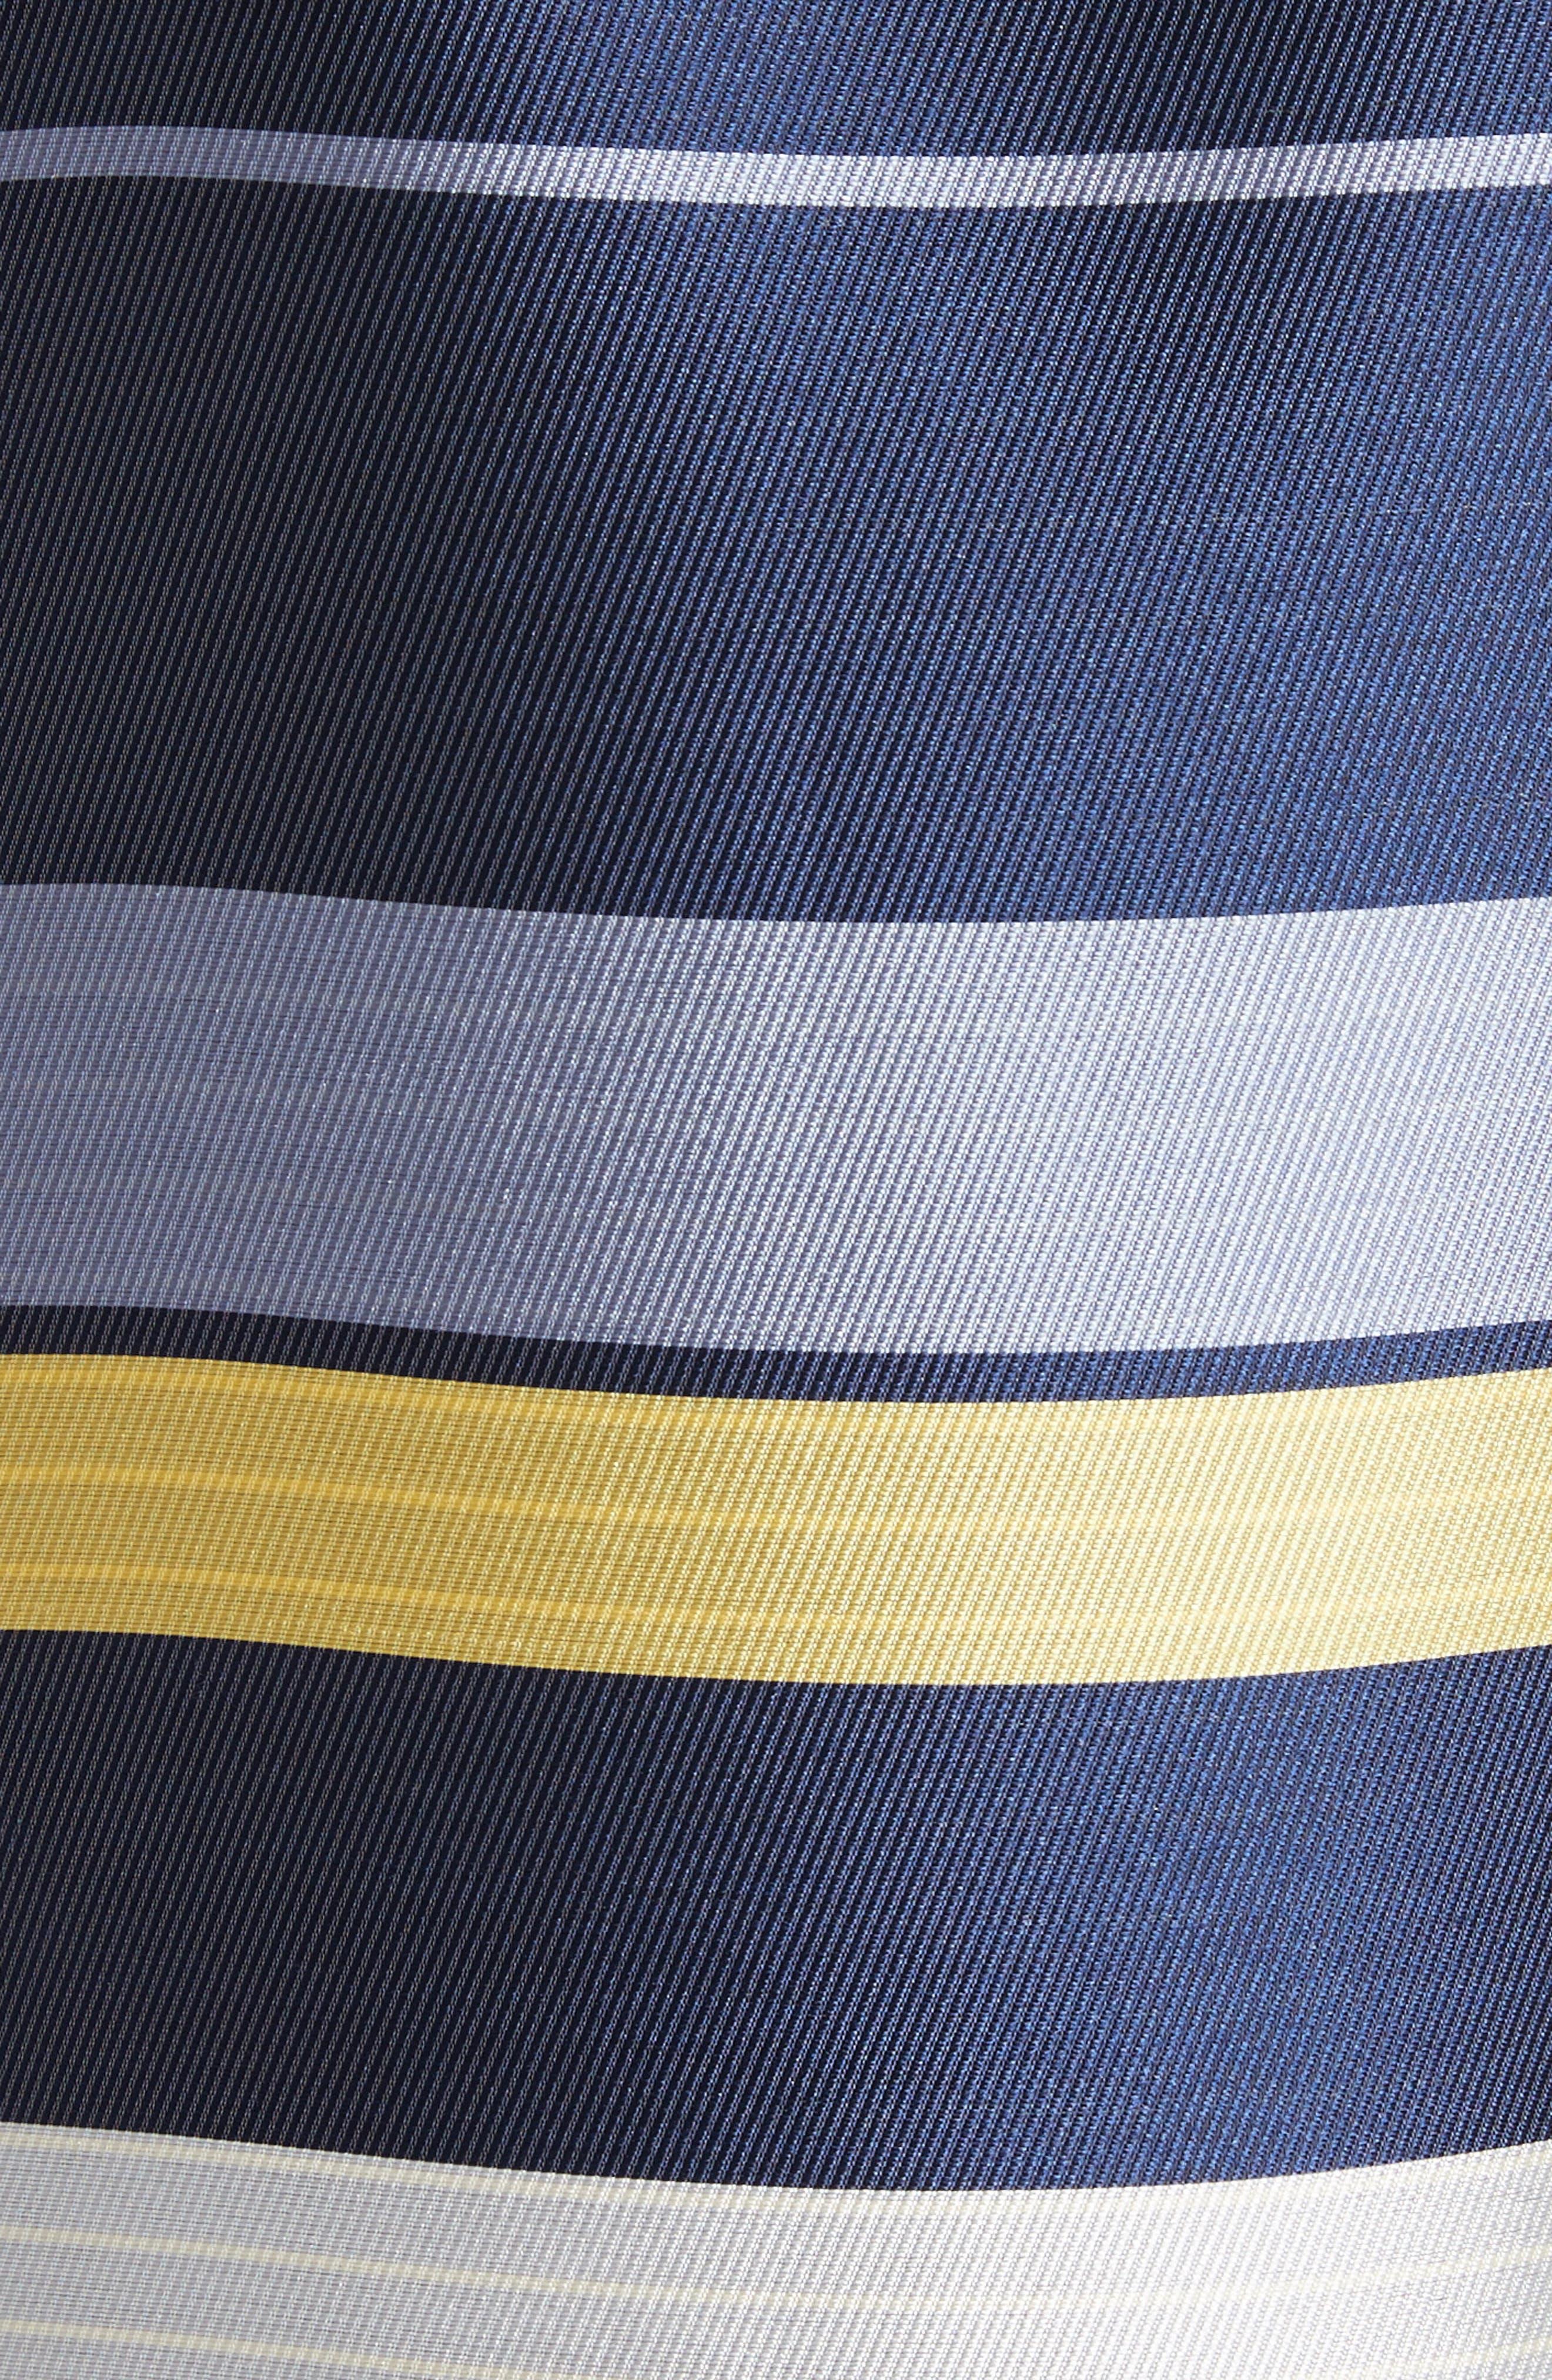 Double Face Stripe Twill Jacket,                             Alternate thumbnail 6, color,                             420